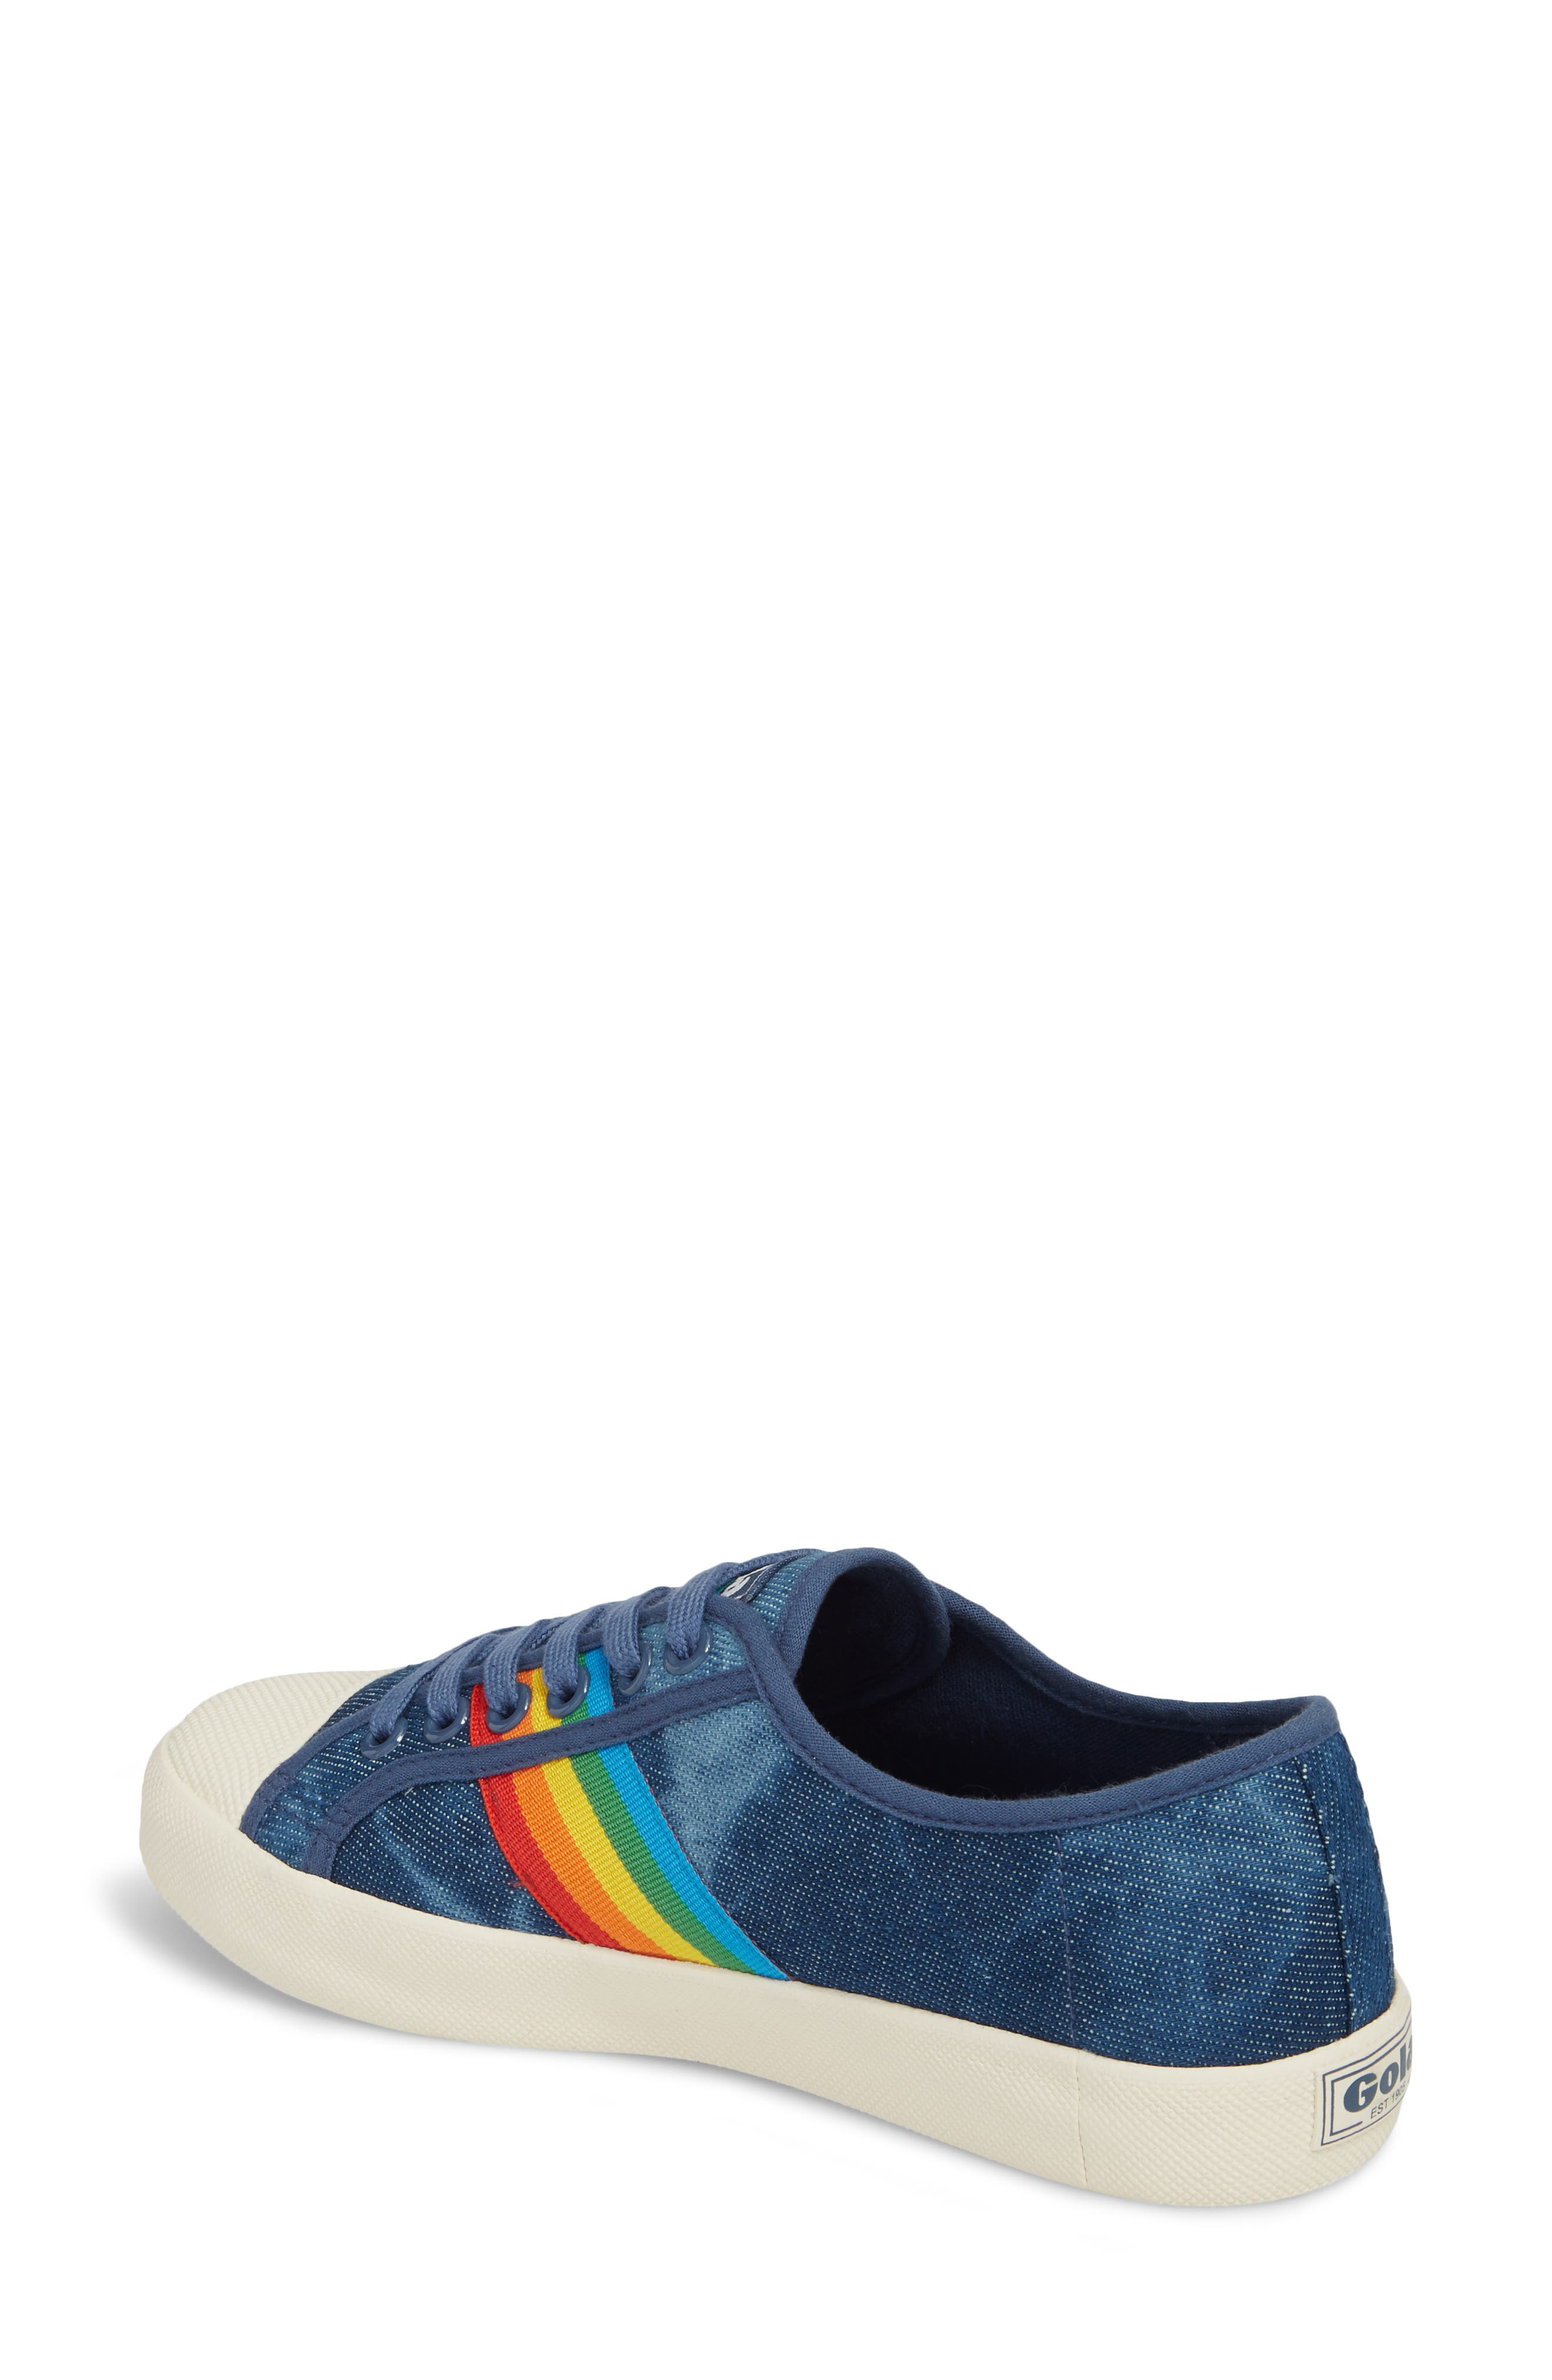 Alternate Image 2  - Gola Coaster Rainbow Striped Sneaker (Women)